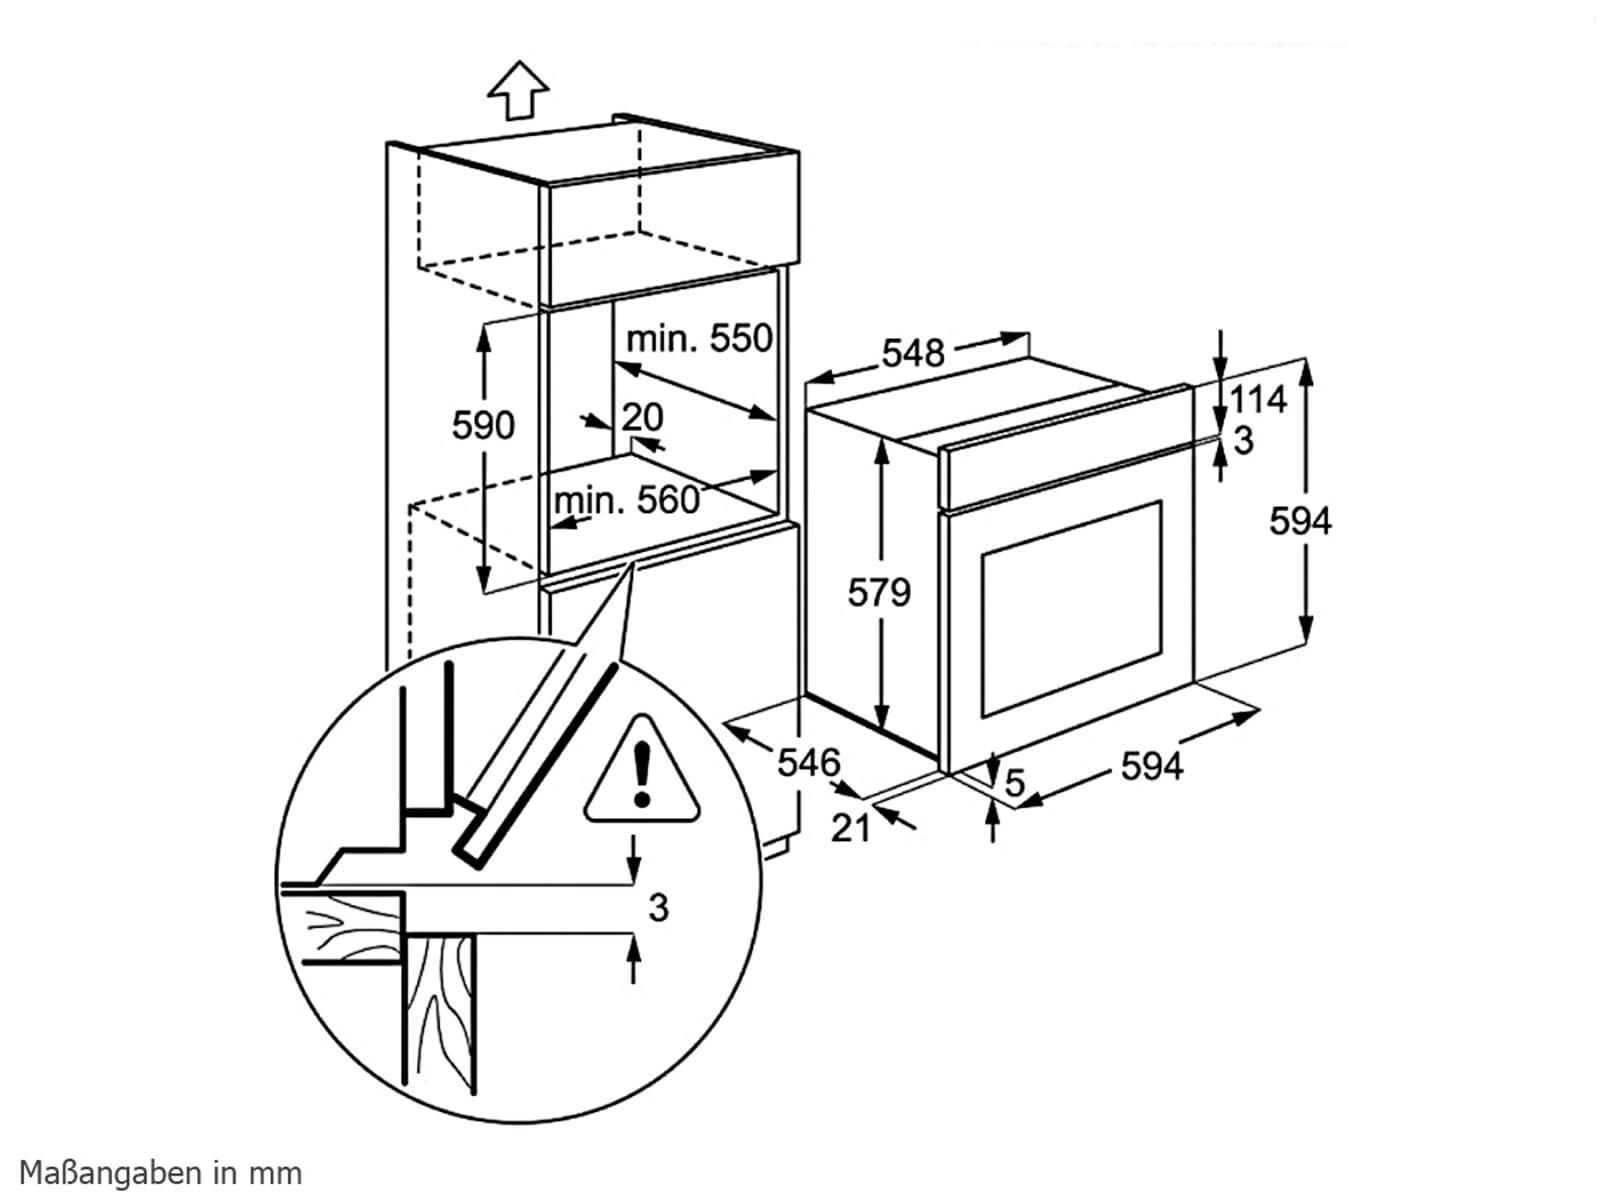 aeg be4003001m backofen edelstahl einbaubackofen. Black Bedroom Furniture Sets. Home Design Ideas